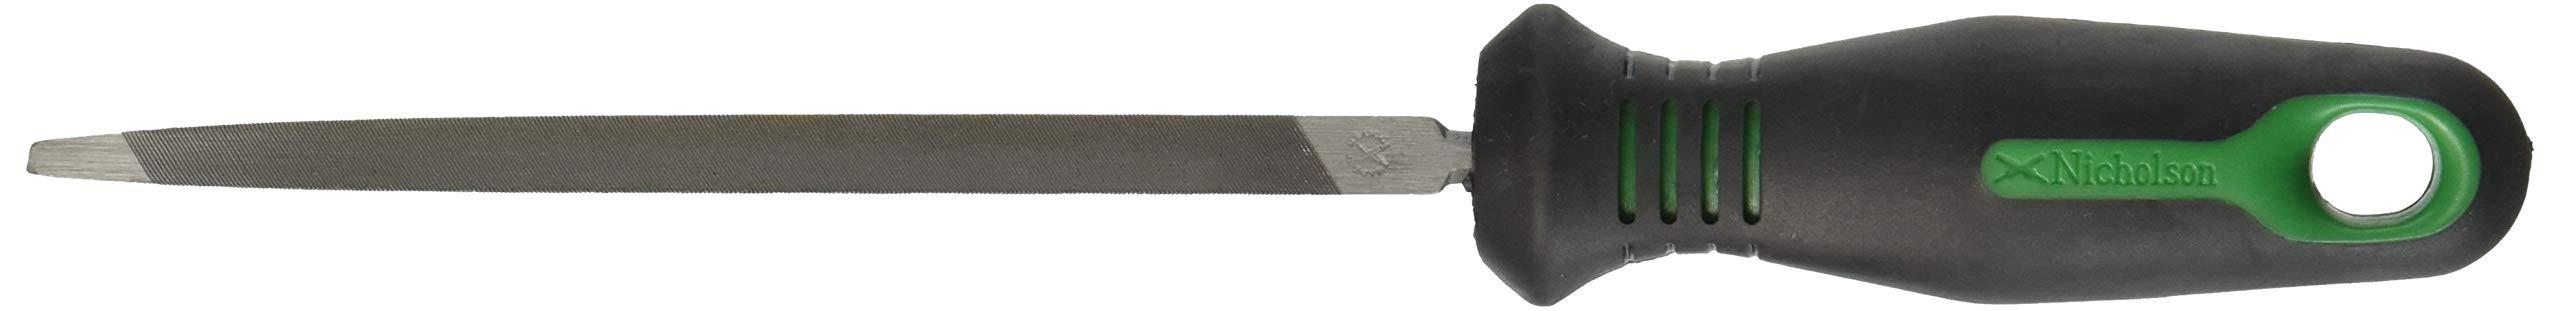 NICHOLSON 22150HI Home Hand Tools Files